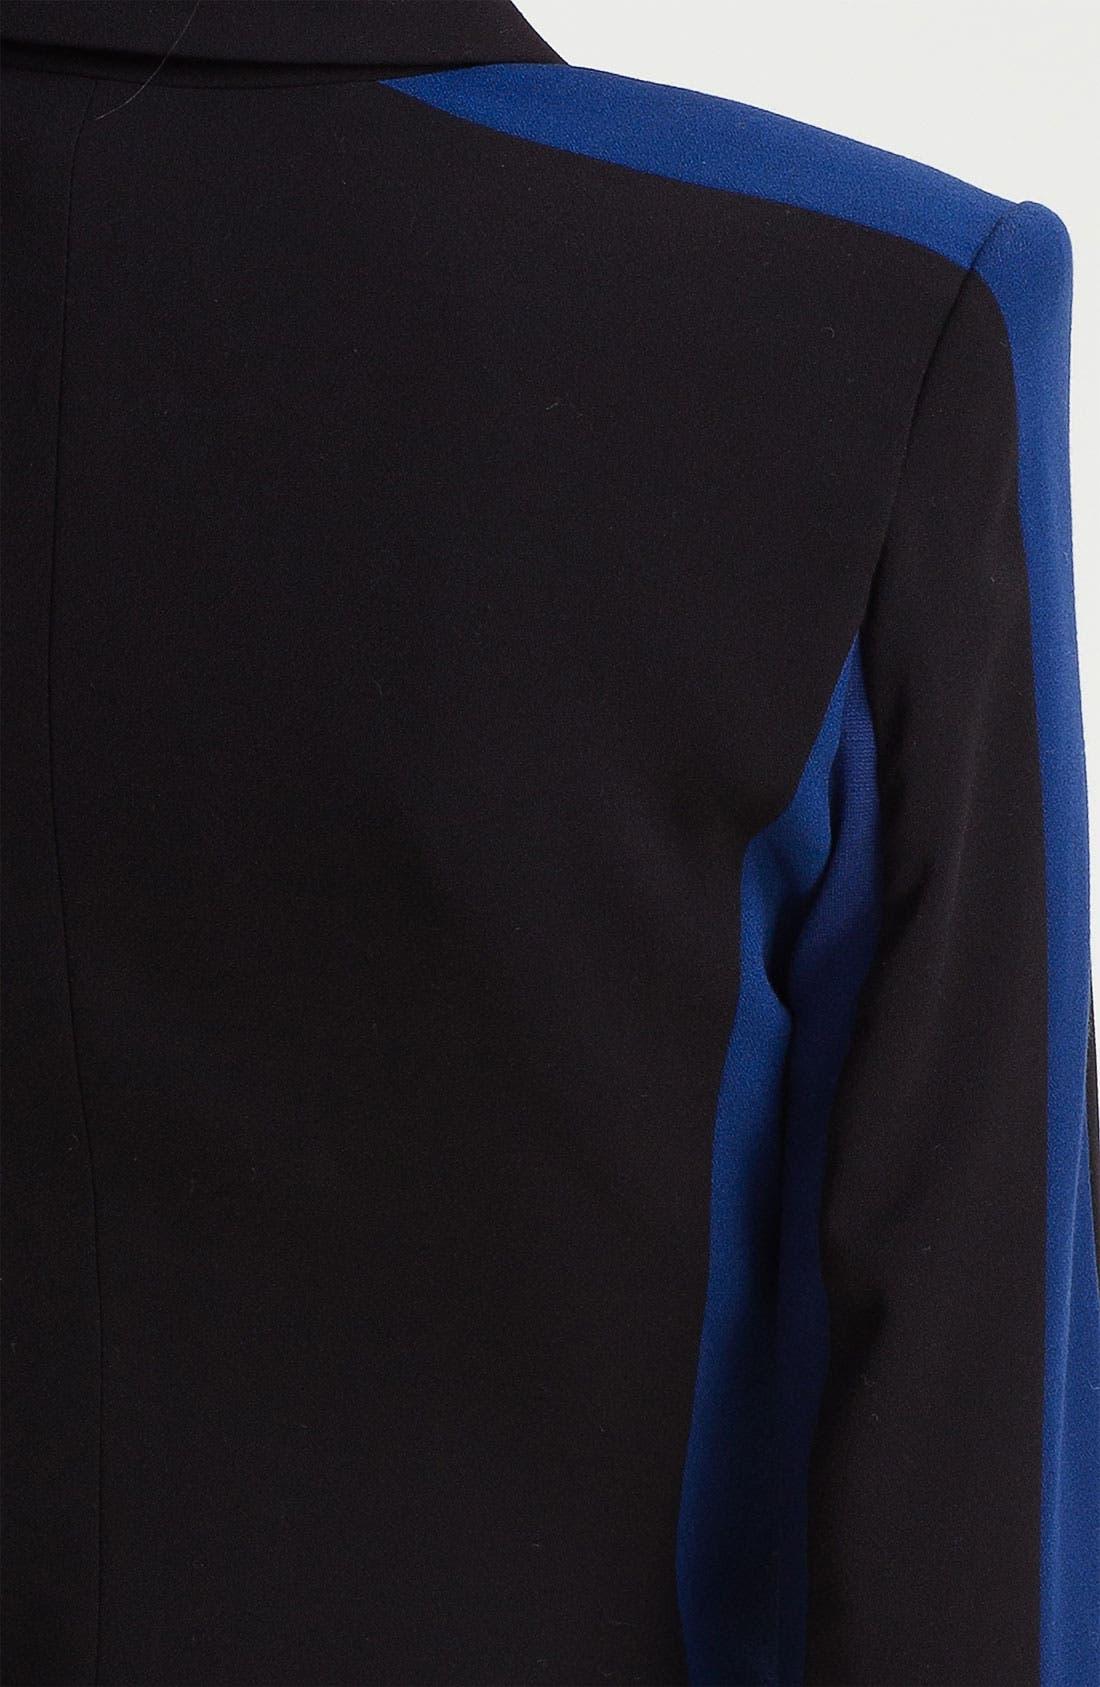 Woven Jacket,                             Alternate thumbnail 3, color,